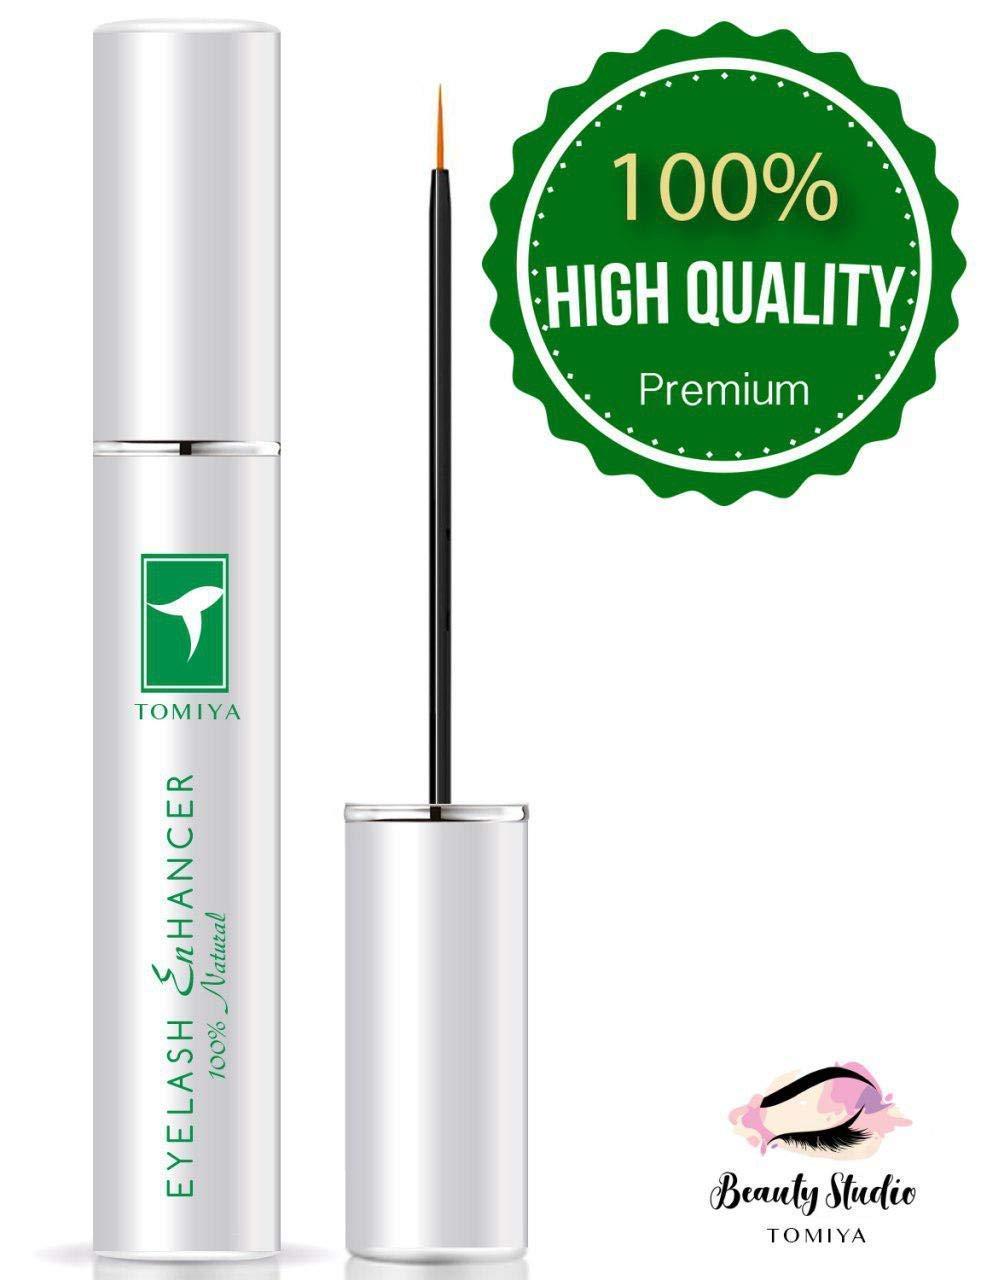 Tomiya SMD00241 Natural Extract Eyelash Growth Serum FEG Eyelash Enhancer for Longer, Thicker and Fuller Eyelash Good Selection Ltd